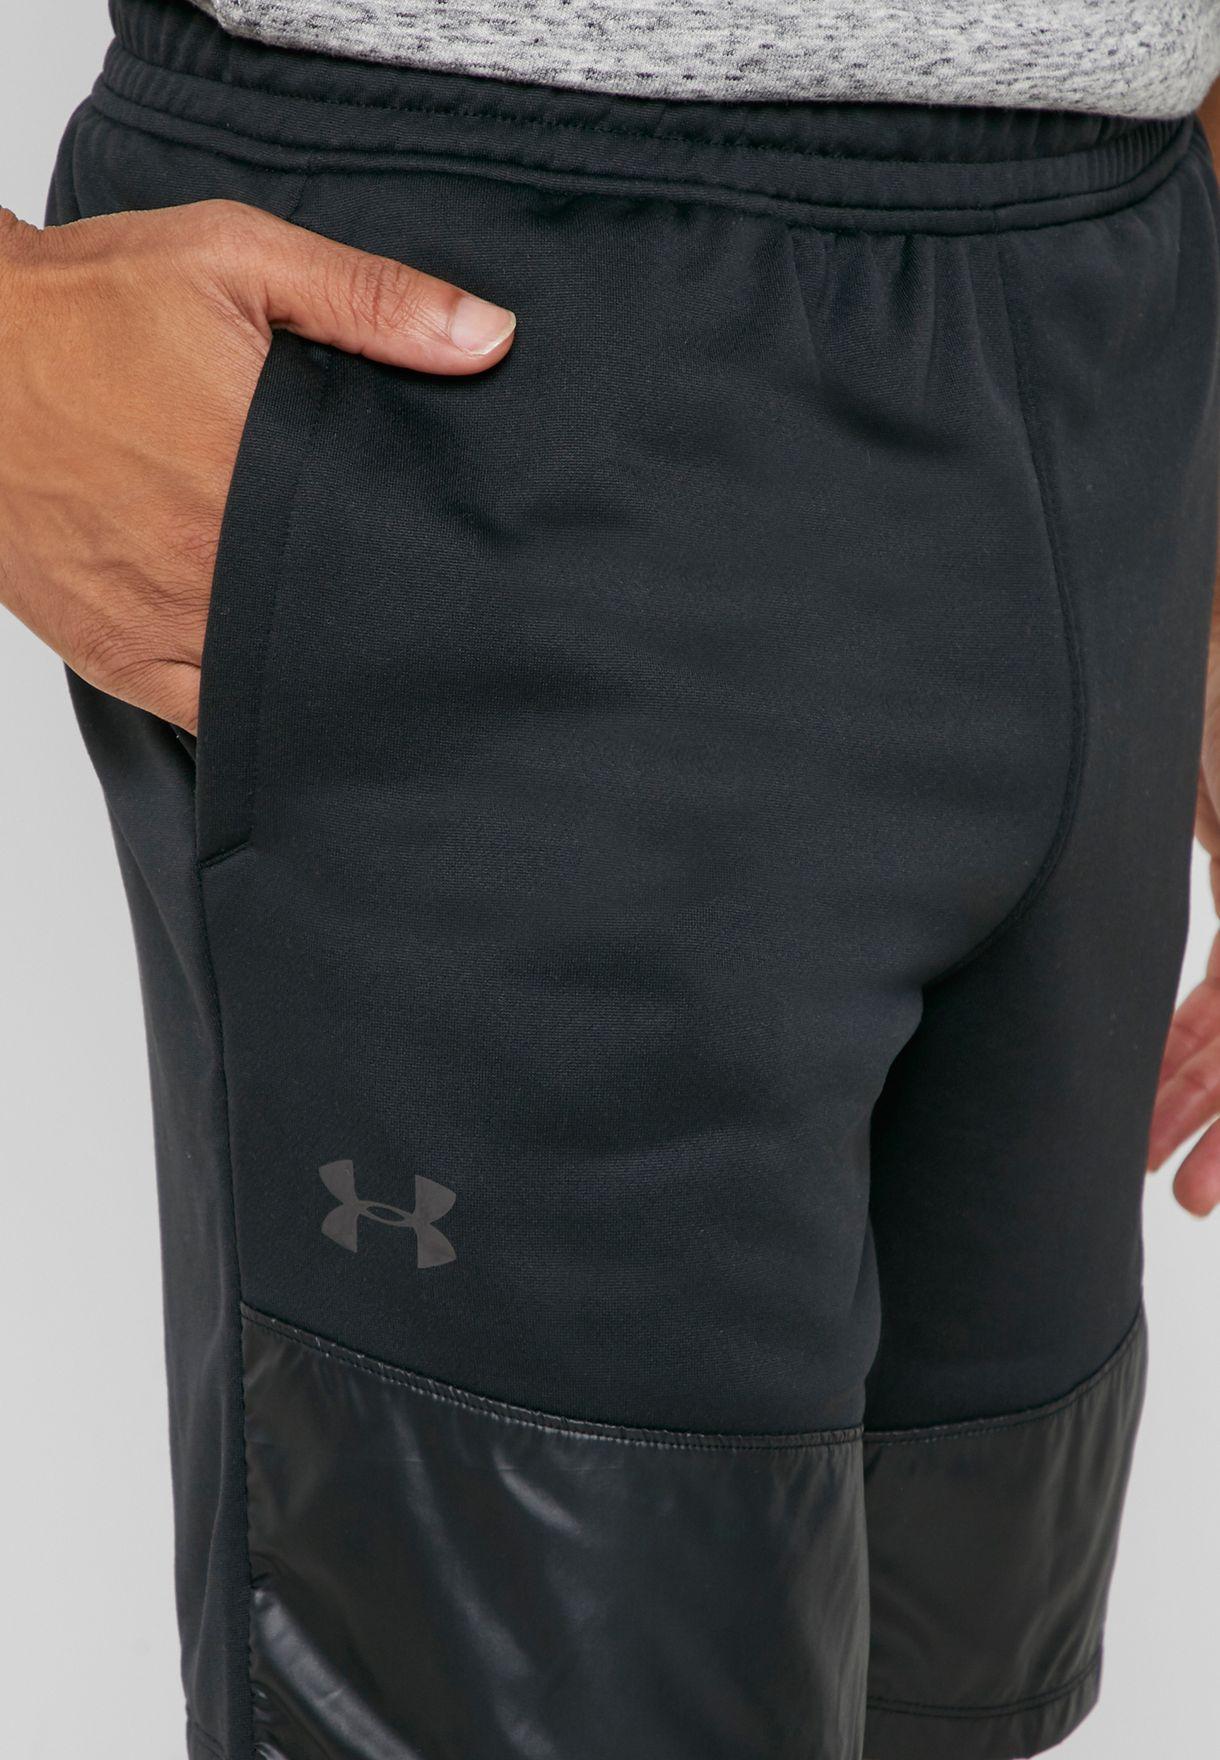 MK1 Terry Shorts